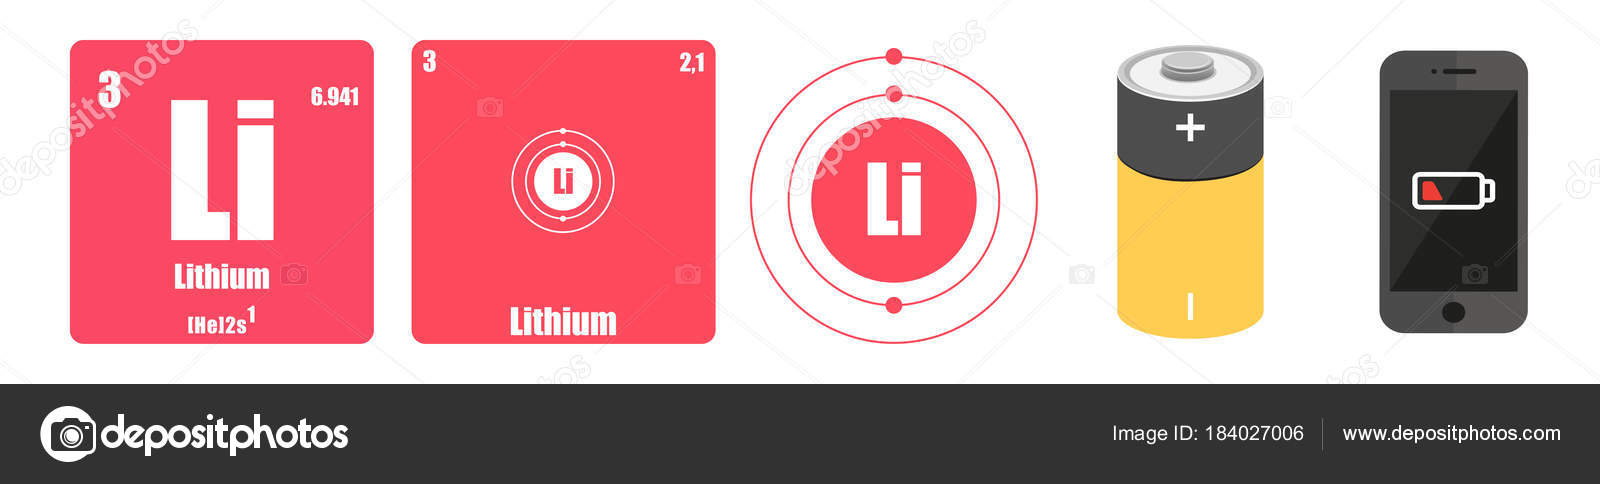 Periodic Table Van Element Groep I De Alkalimetalen Lithium Li